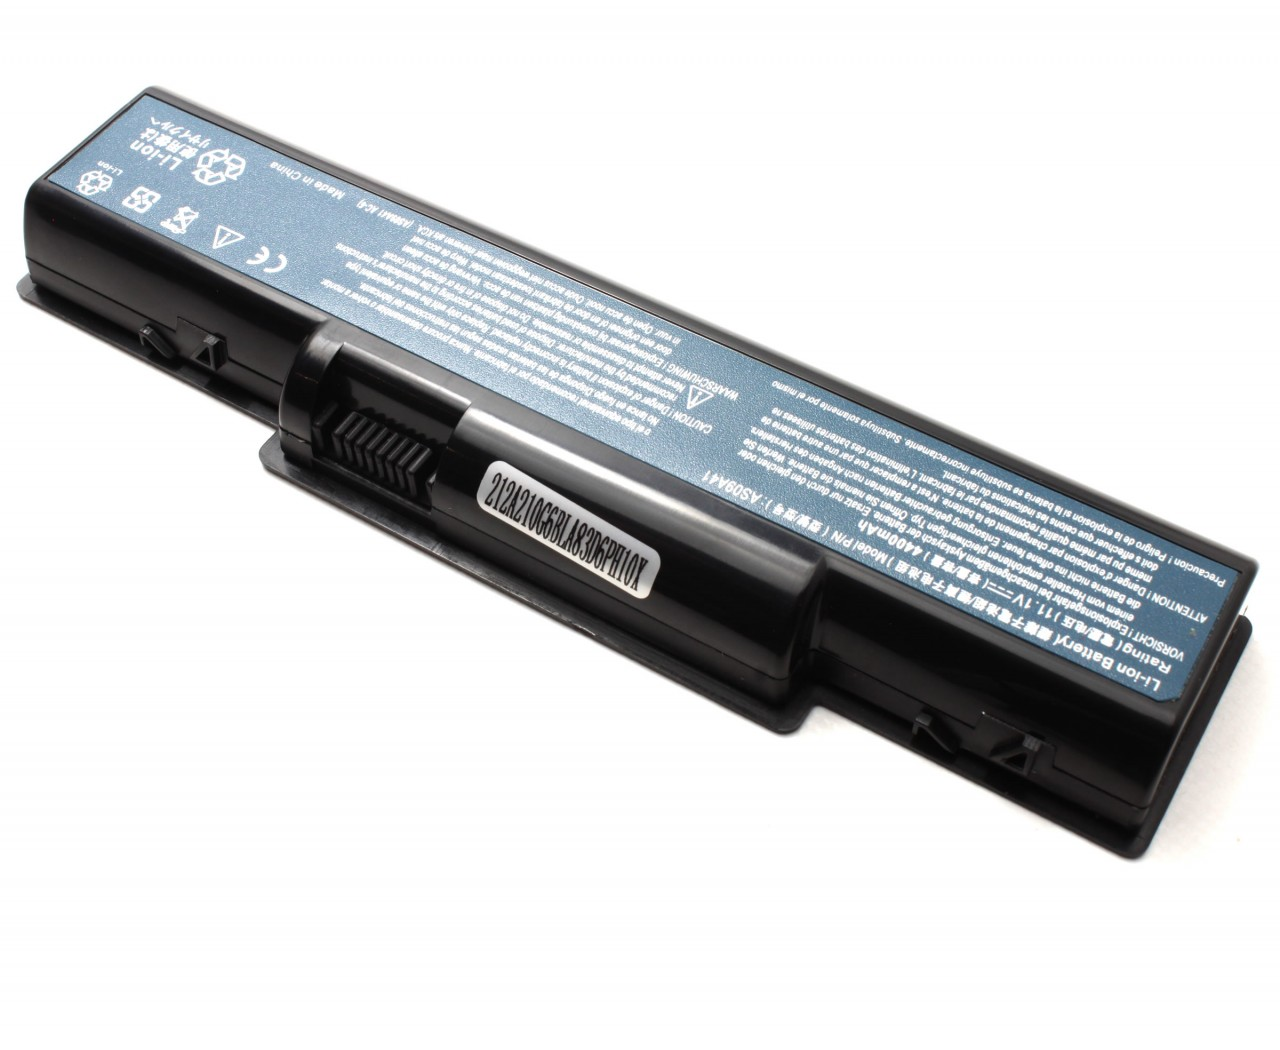 Baterie Packard Bell EasyNote TJ61 Ver.2 imagine powerlaptop.ro 2021